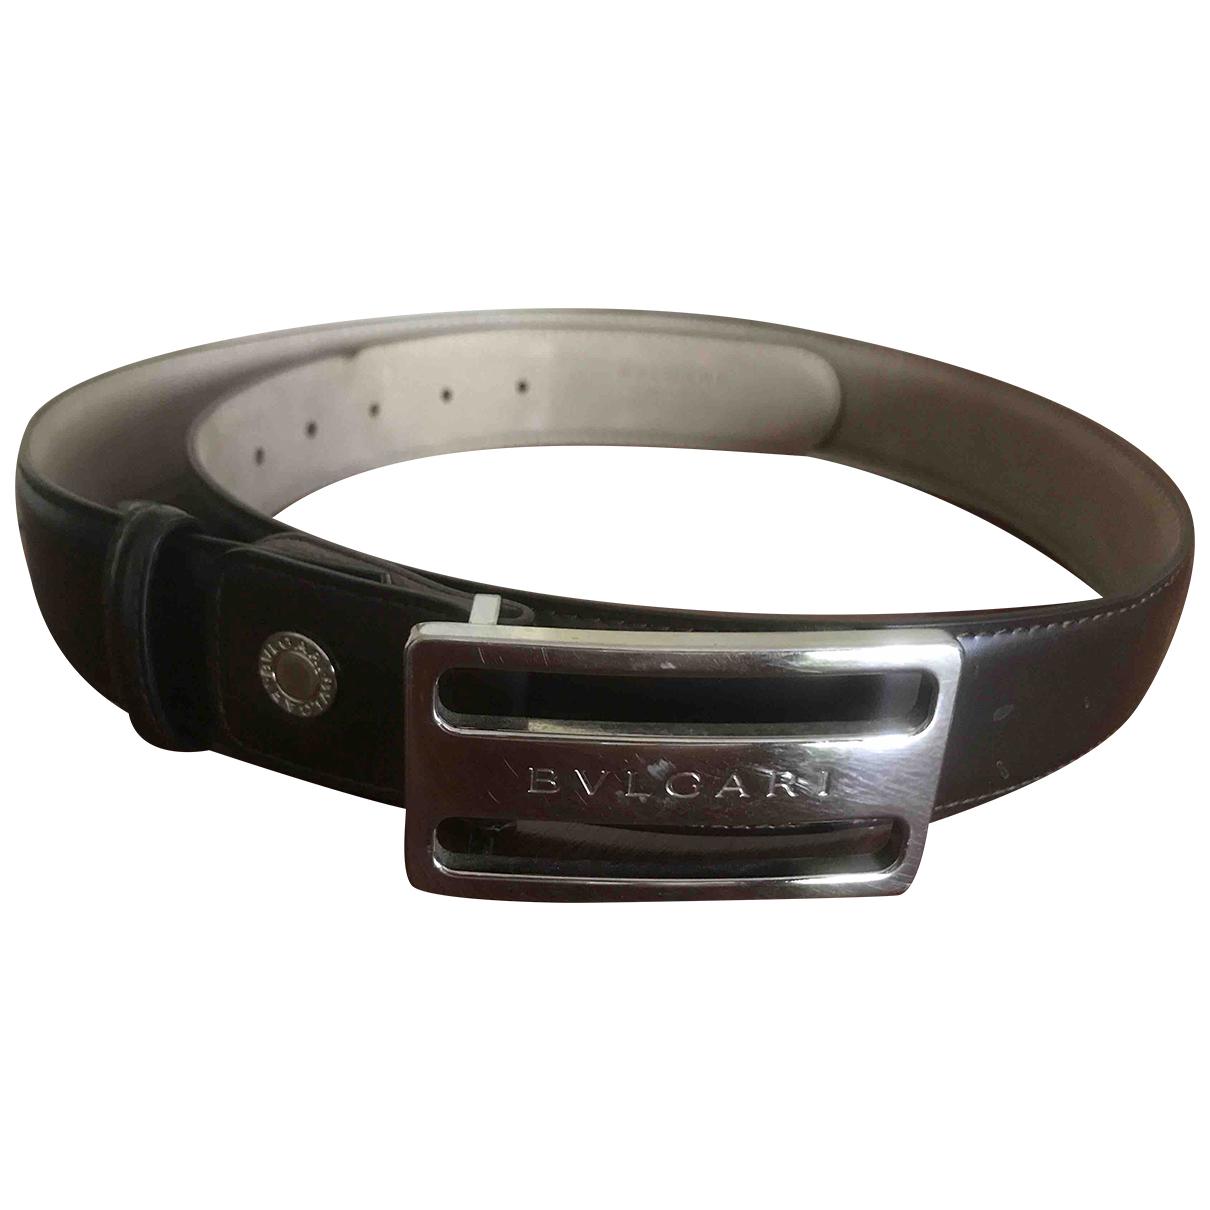 Bvlgari \N Brown Leather belt for Women M International